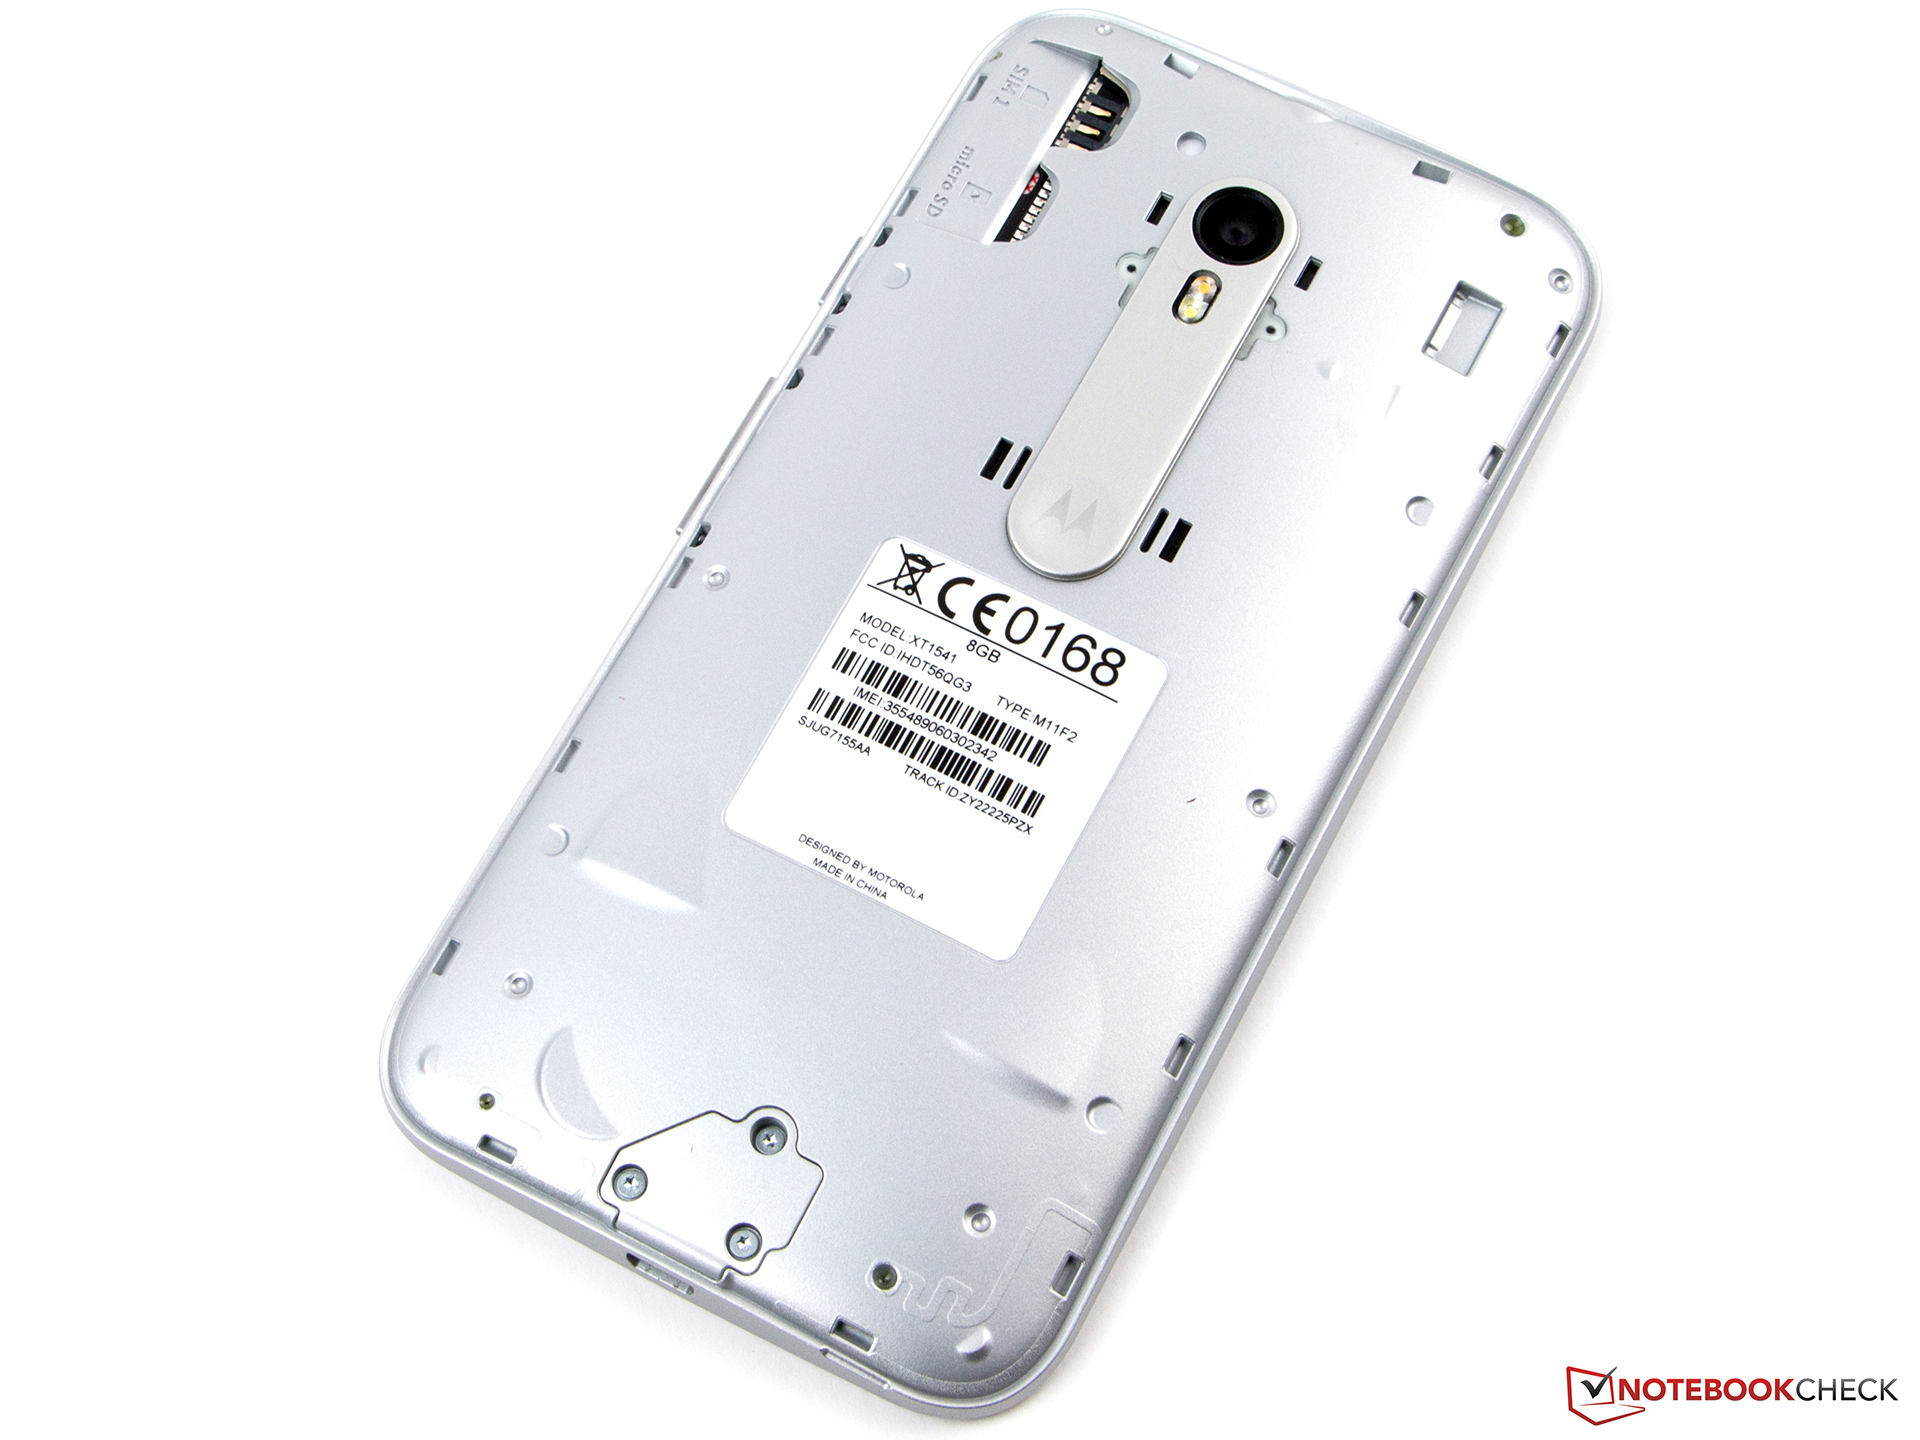 7f9eefb6253 Análisis completo del Smartphone Motorola Moto G (3rd Generation ...